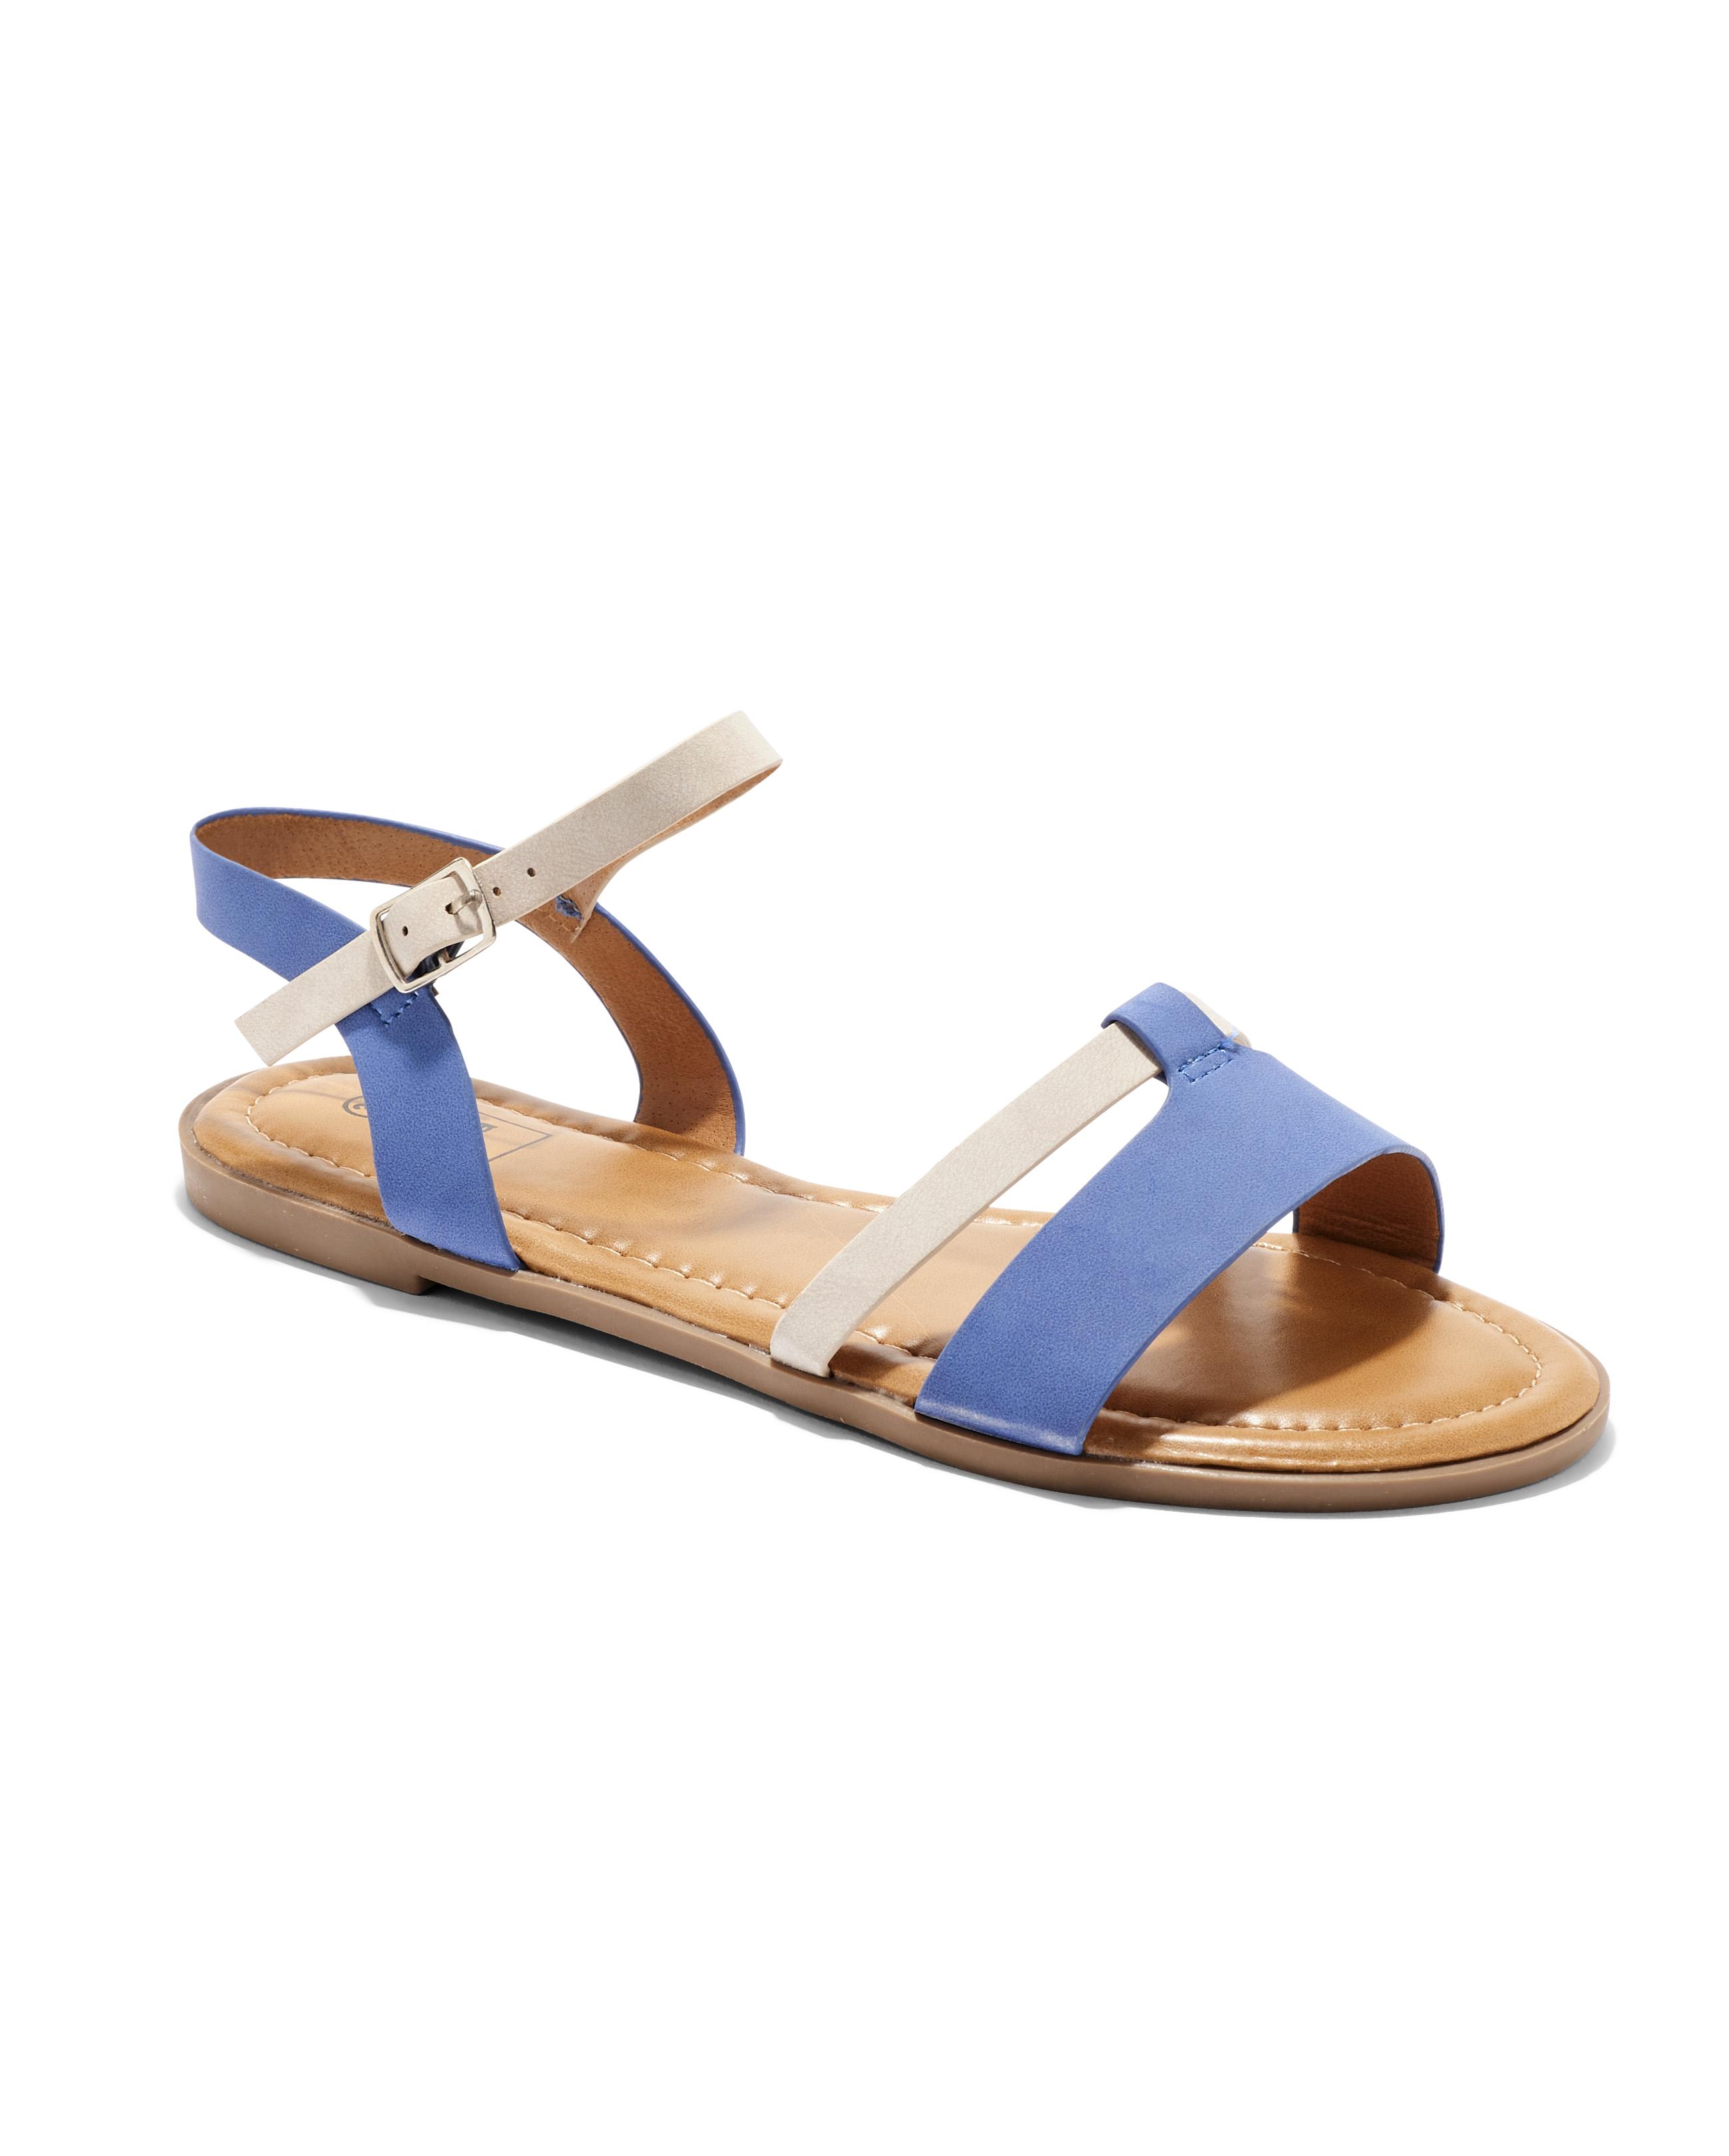 Sandales Plates Femme - Sandale Plate Bleu Jina - Sapl Zh1